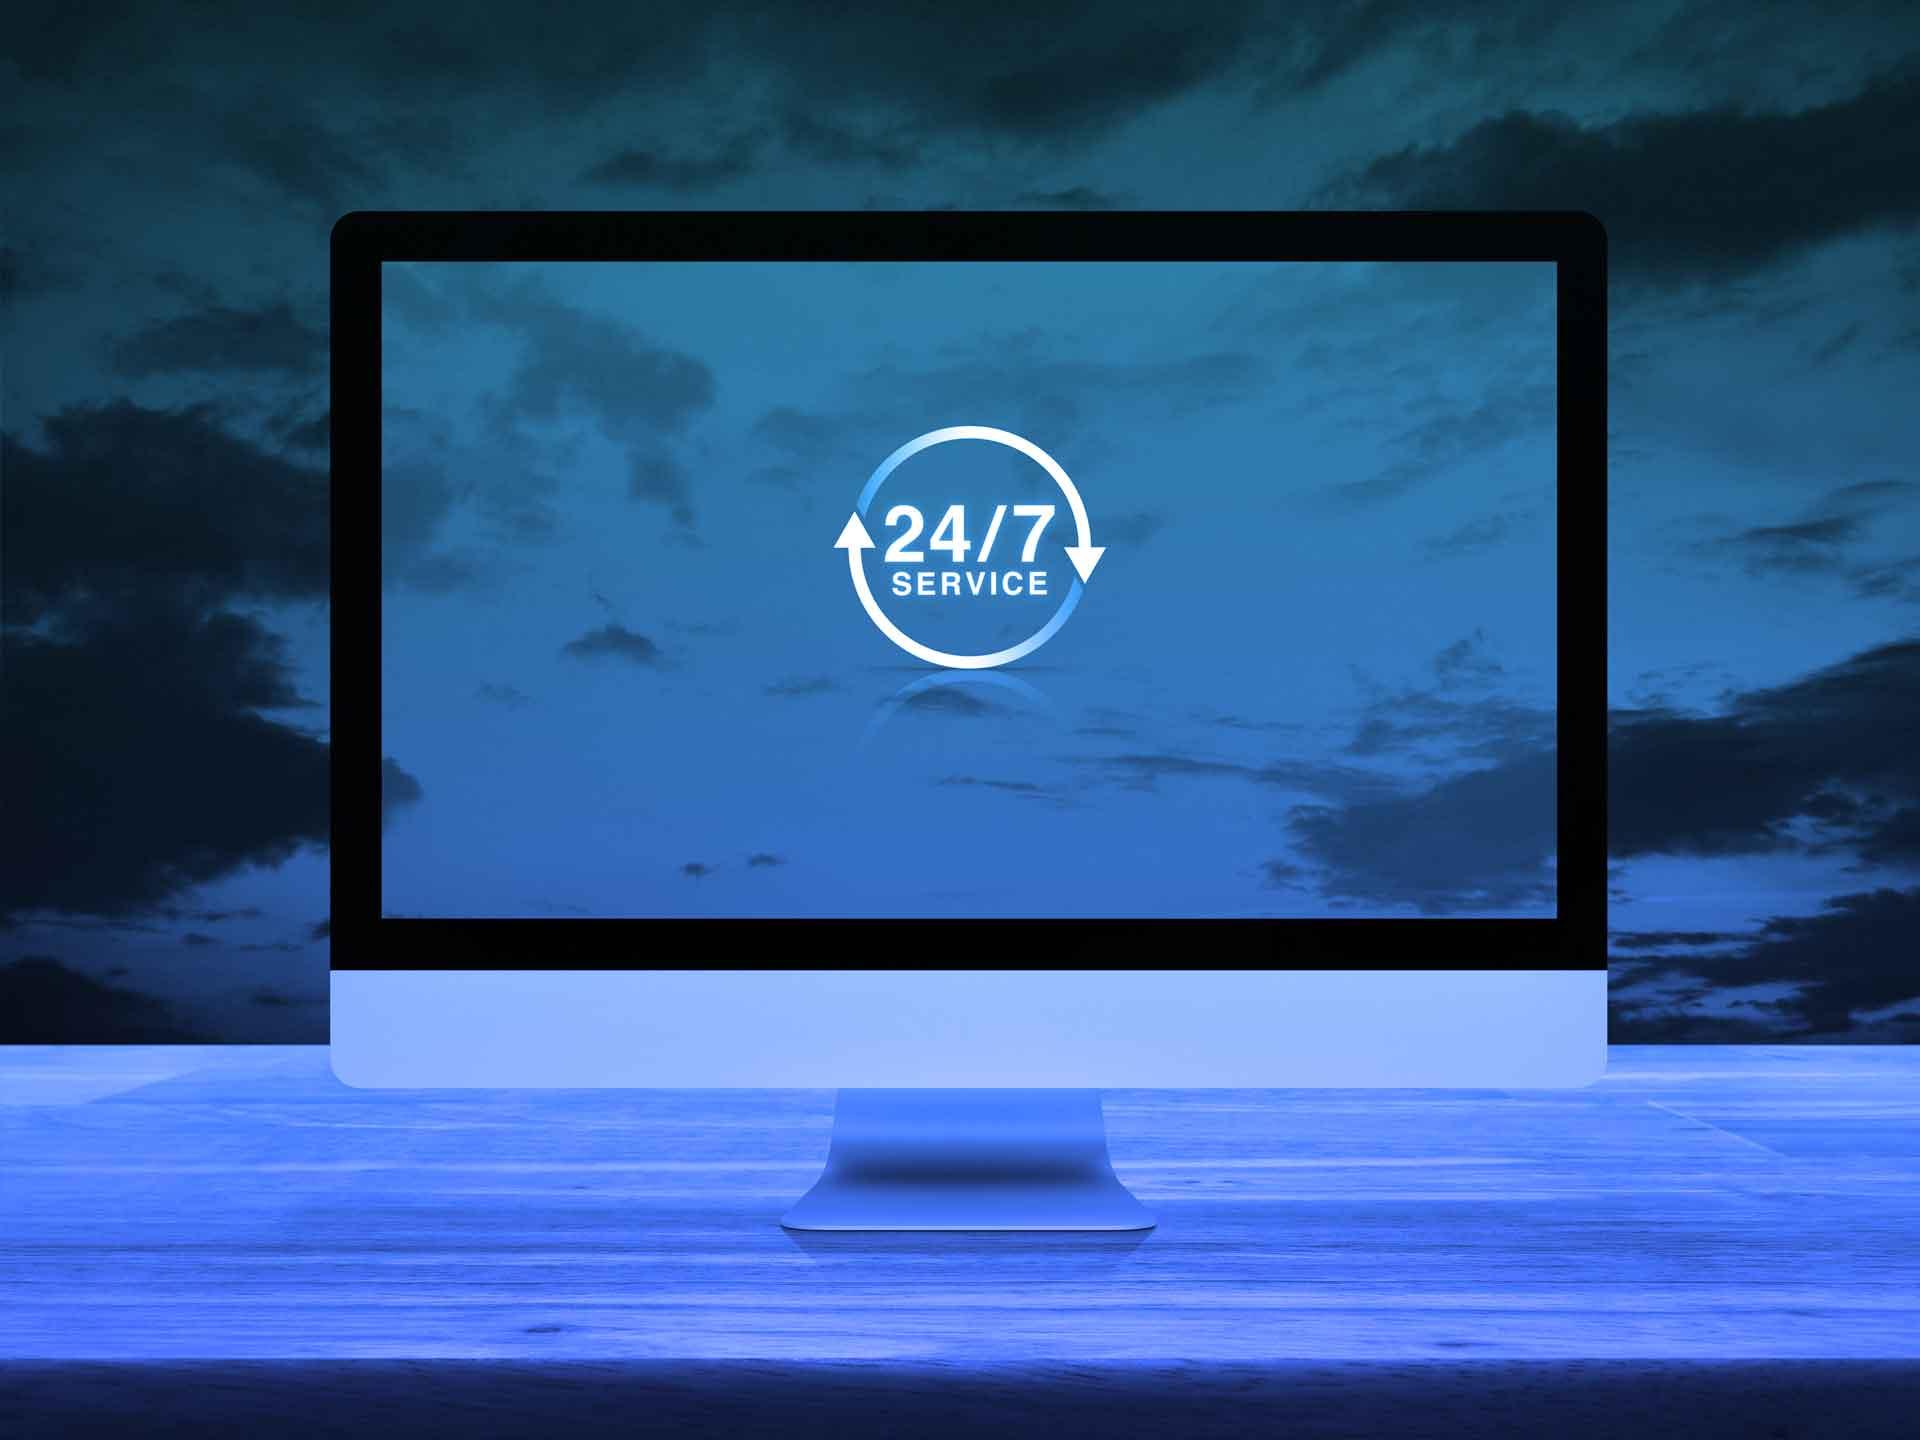 24/7 service met Microsoft Dynamics 365 Customer Service